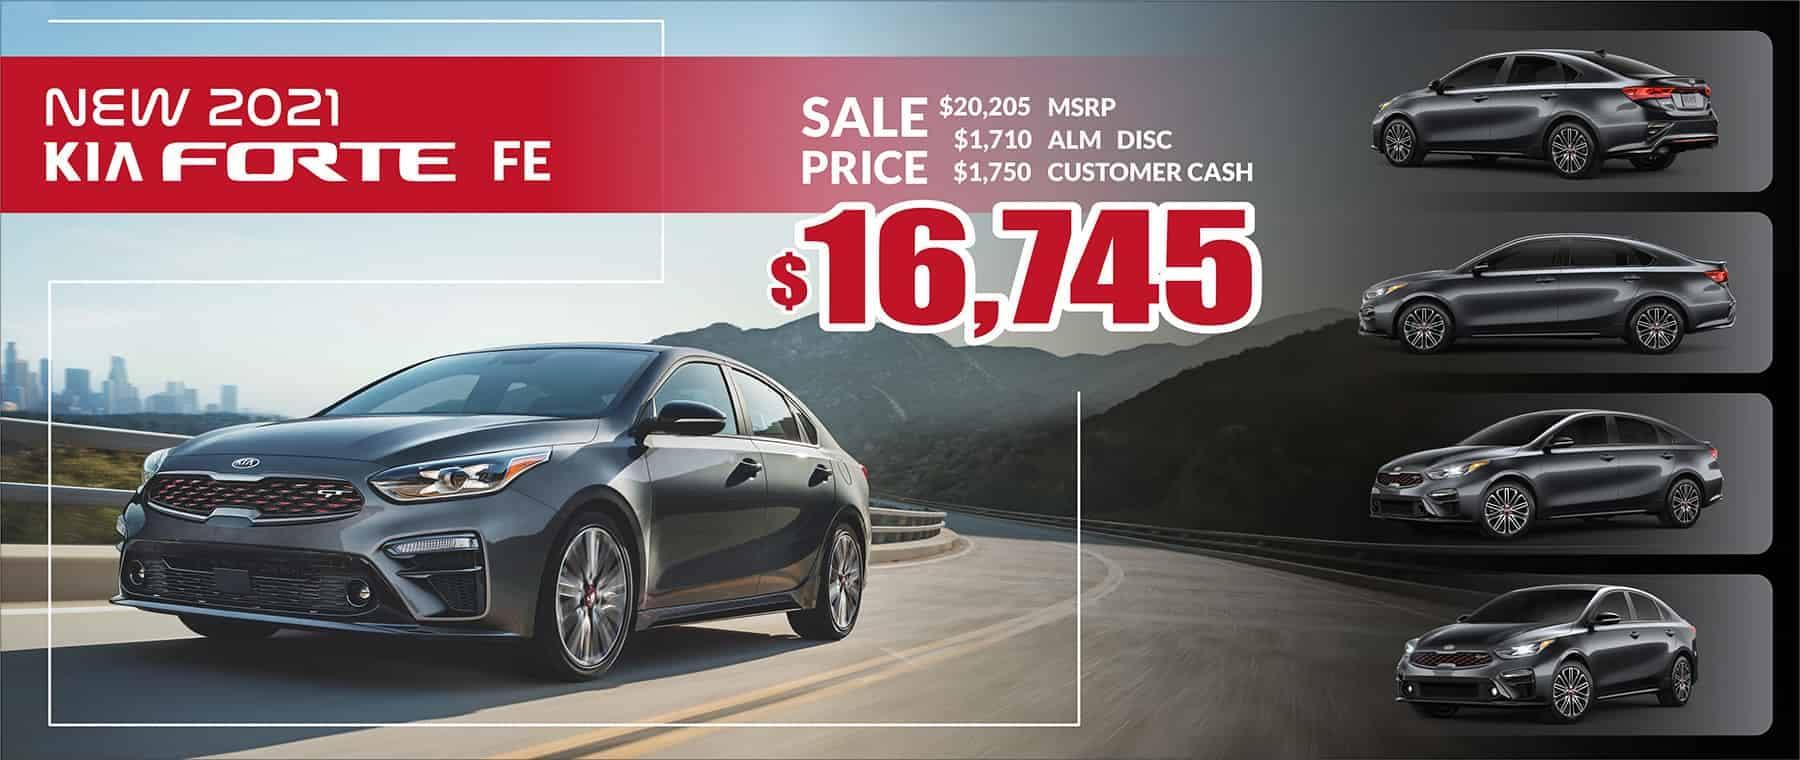 2021 Kia Forte FE Sale Price $16,745